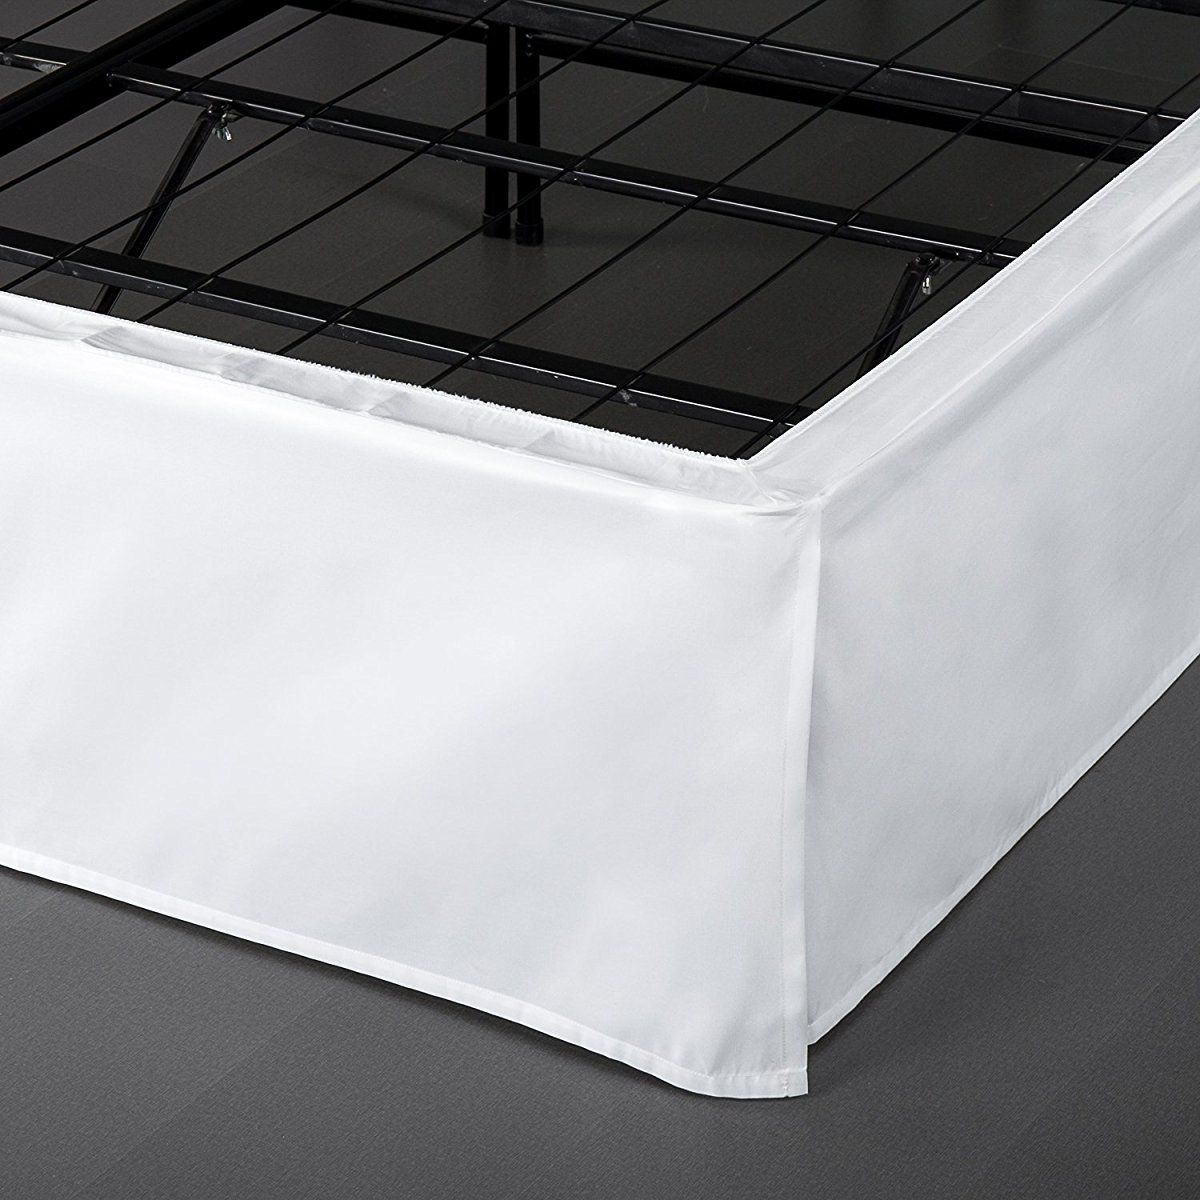 Smartbase Easy On Easy Off Bed Skirt For 14 Inch Smartbase